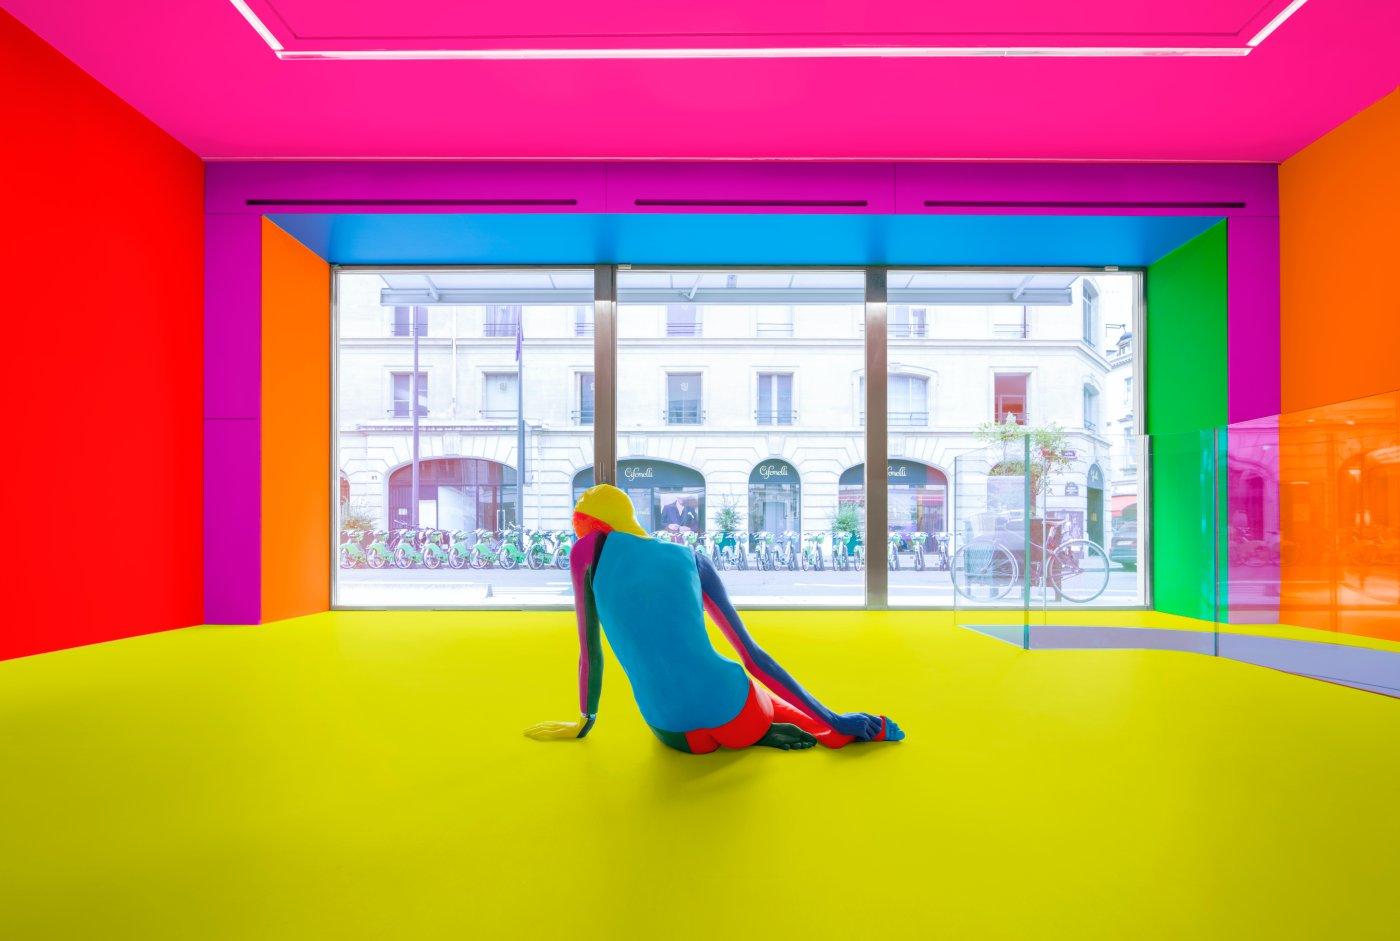 kamel mennour Ugo Rondinone a rainbow 5